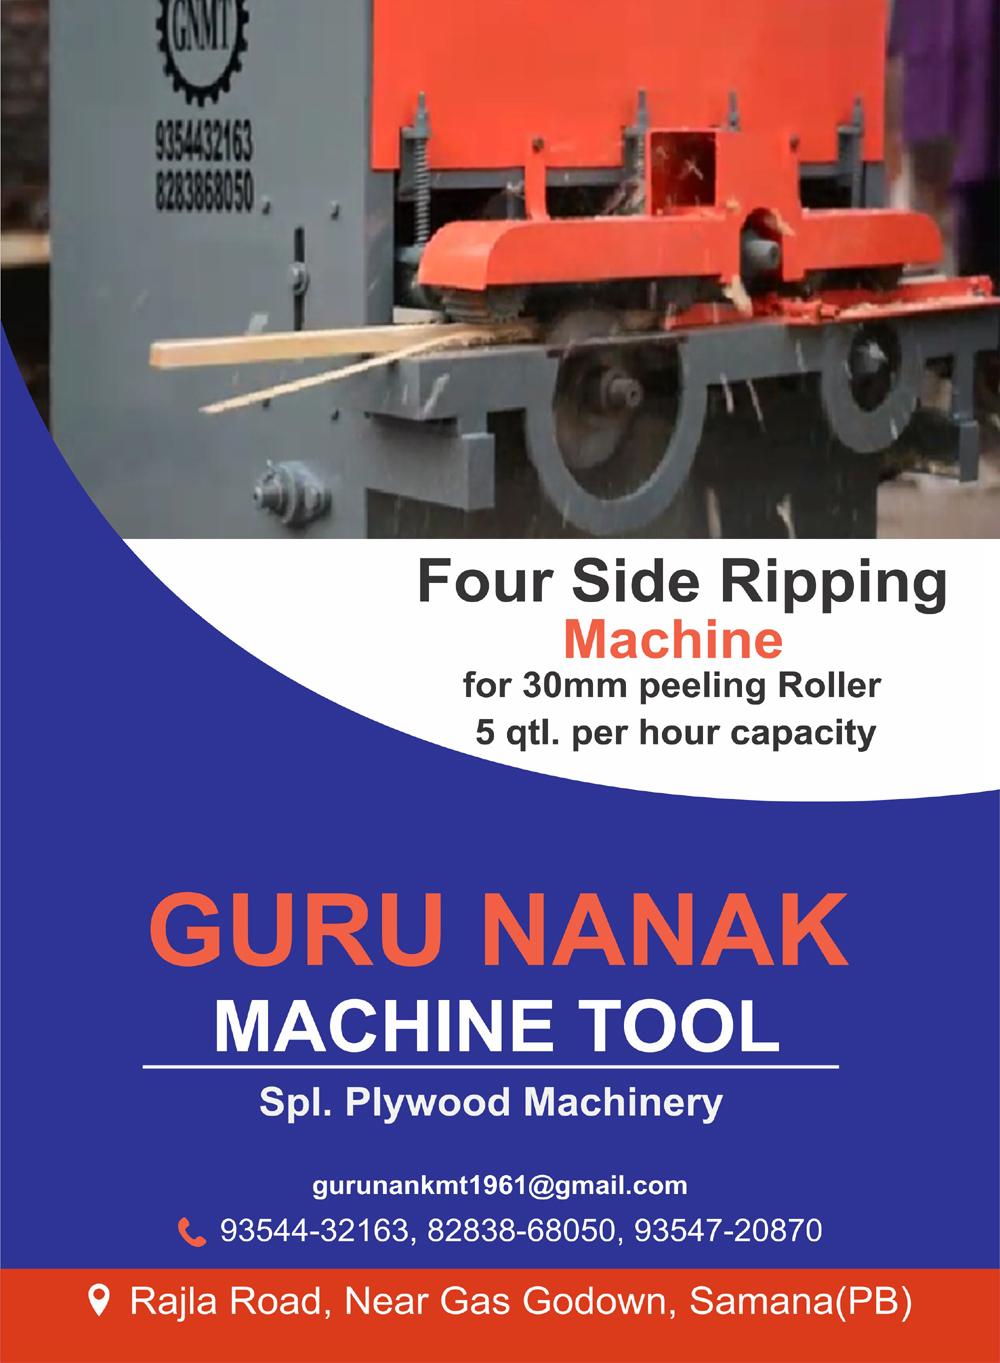 Guru Nanak Machine Tool